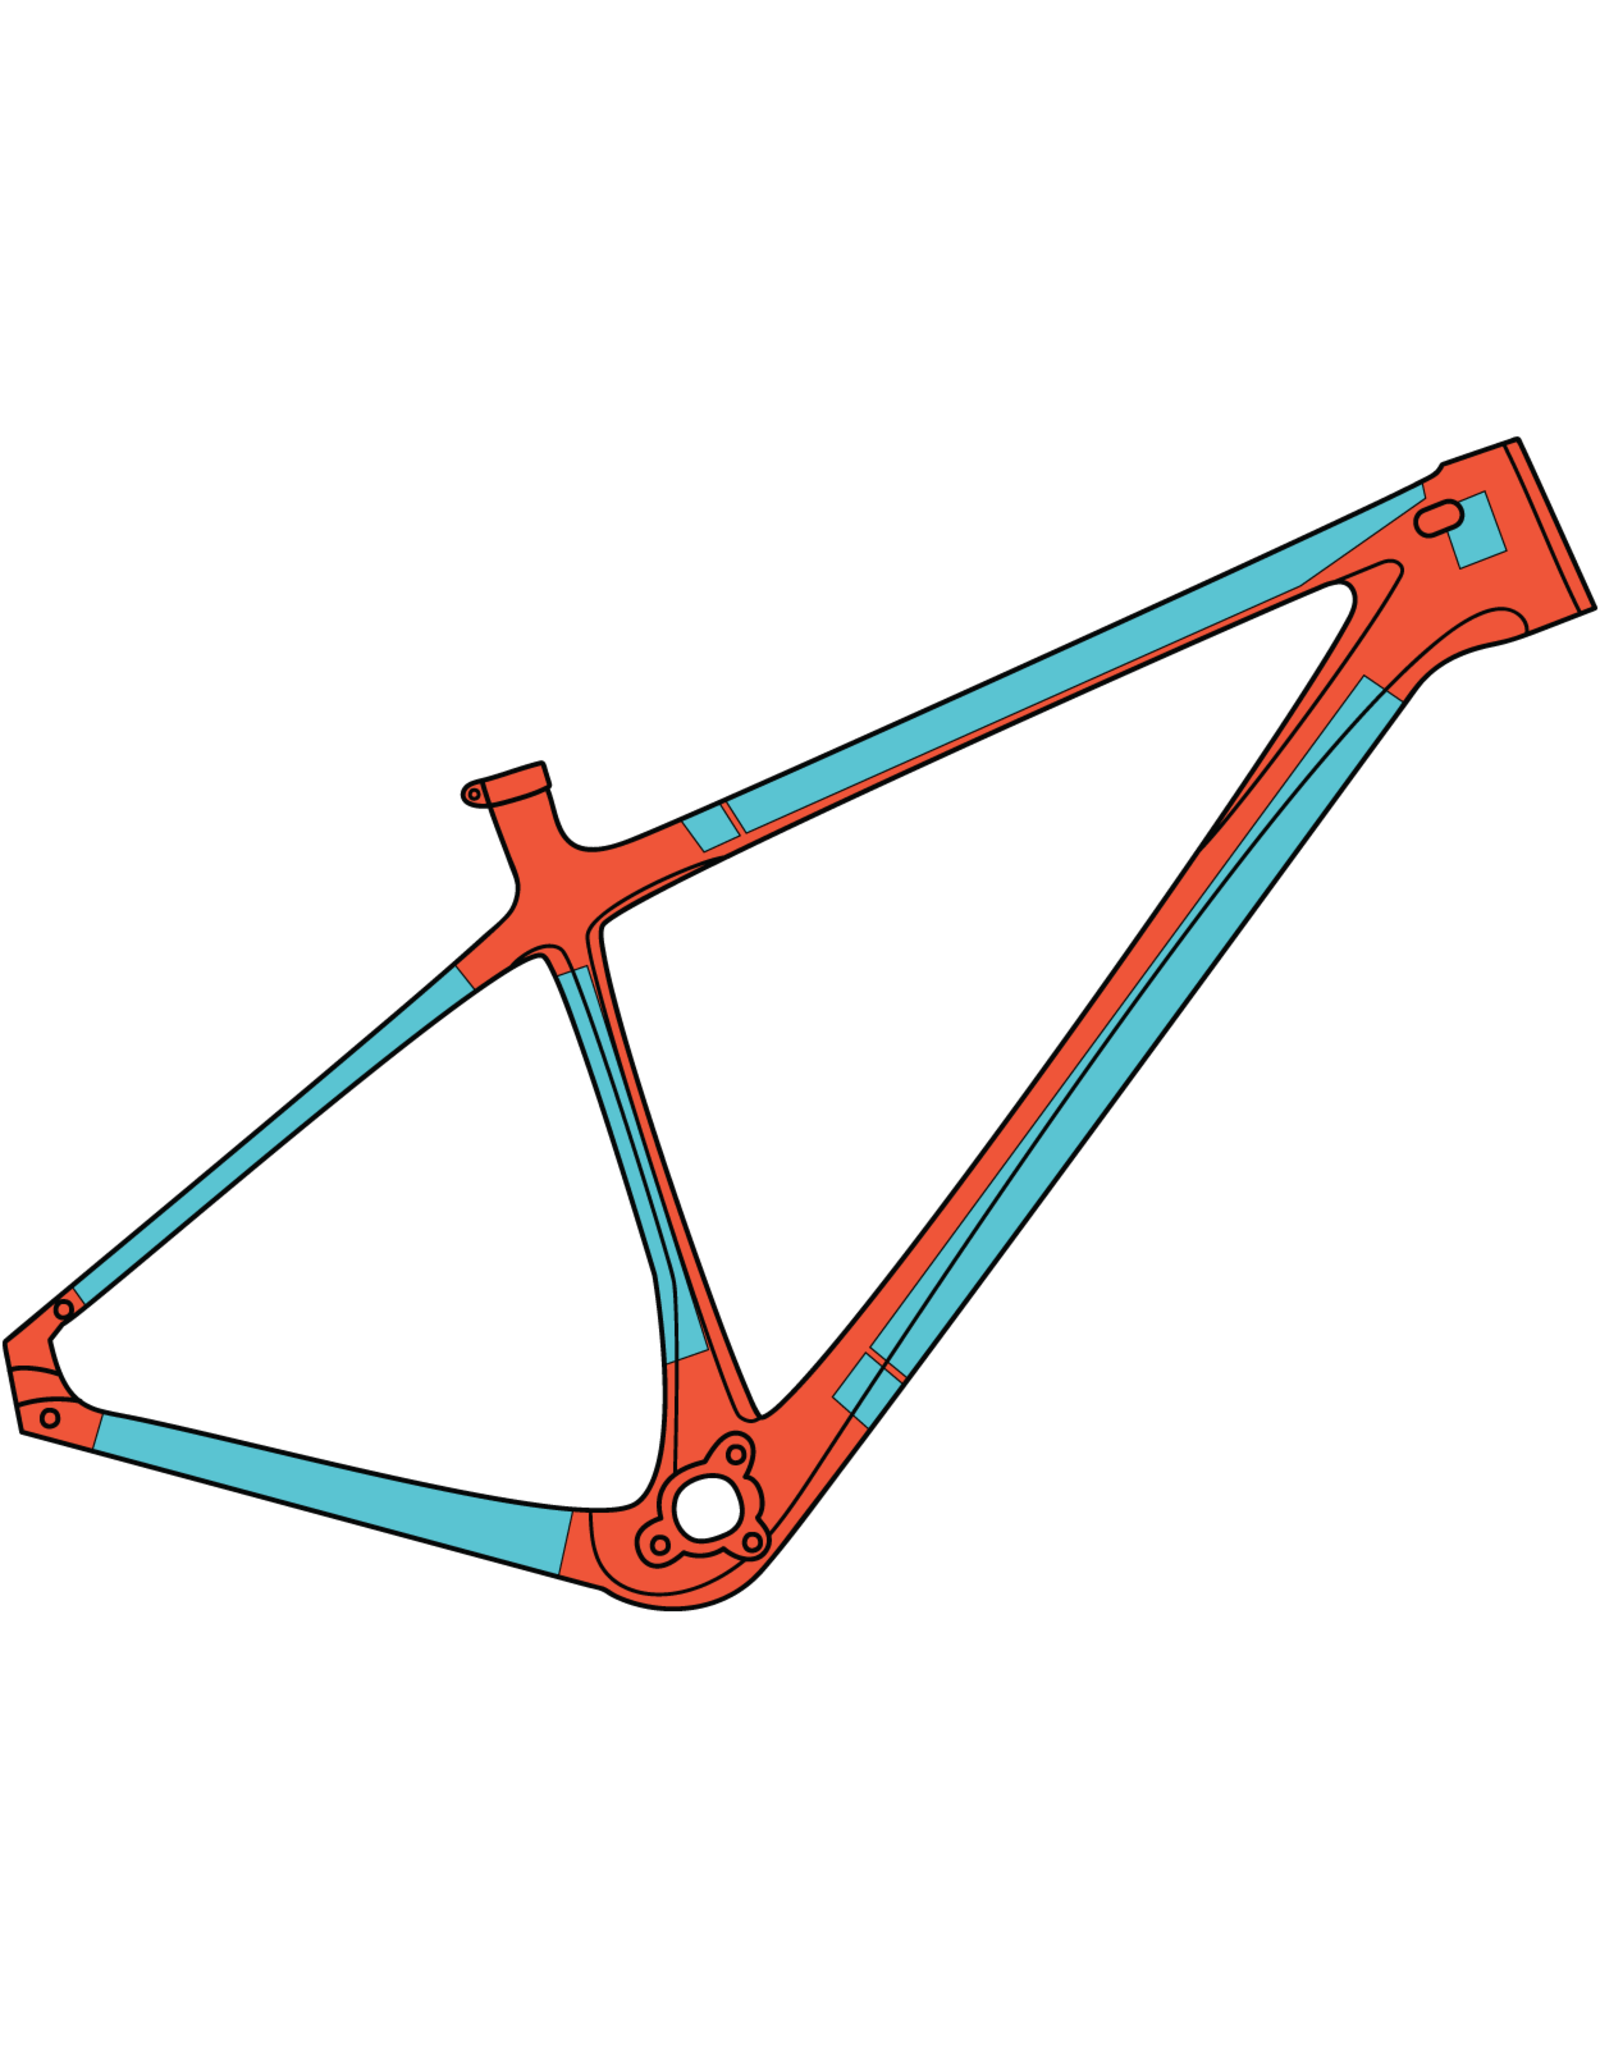 RideWrap RideWrap - Covered Hardtail MTB, Protective Wrap, Matte Clear